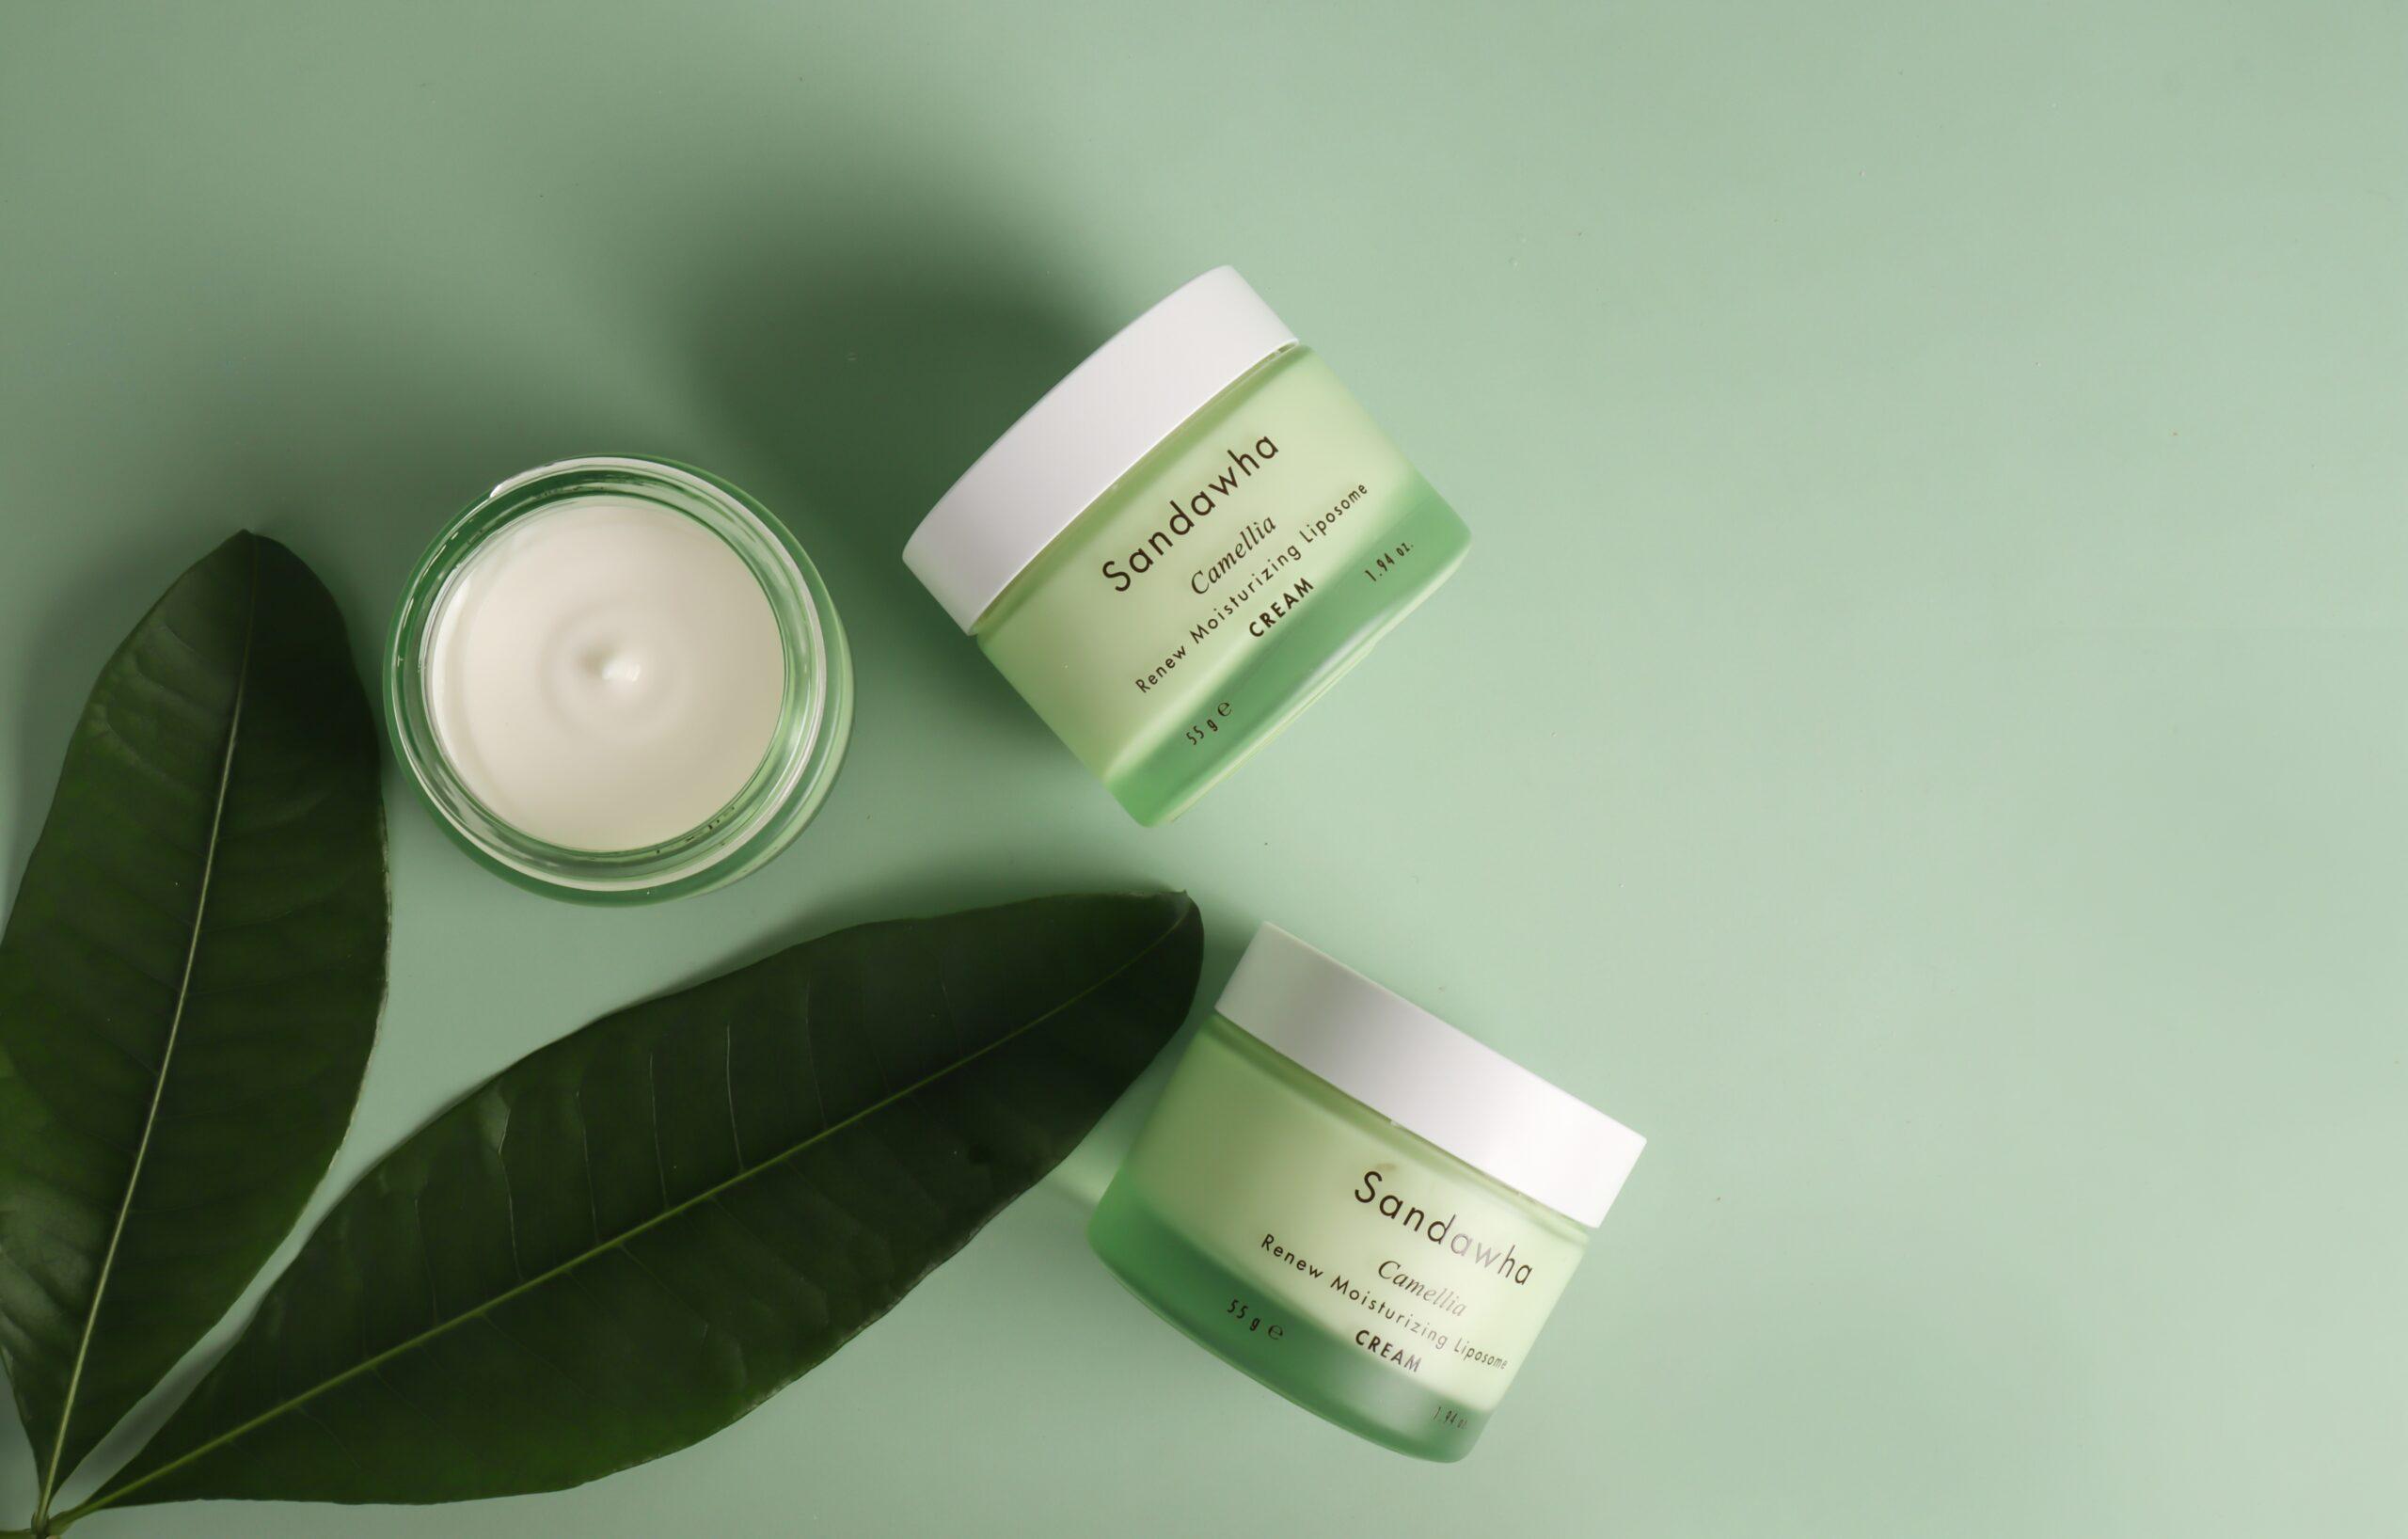 Sandawha Liposome Cream Lief Essentials Vegan Beauty products